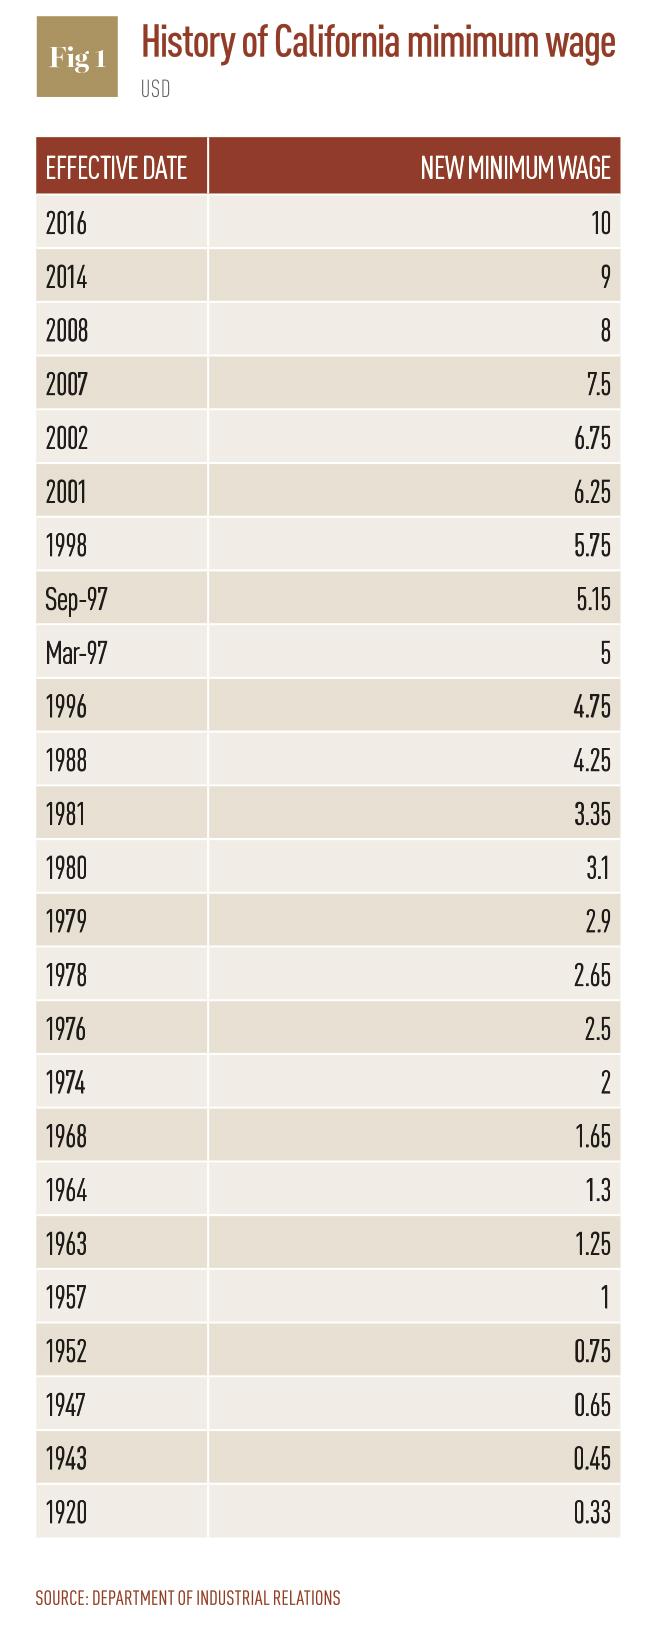 History of California minimum wage